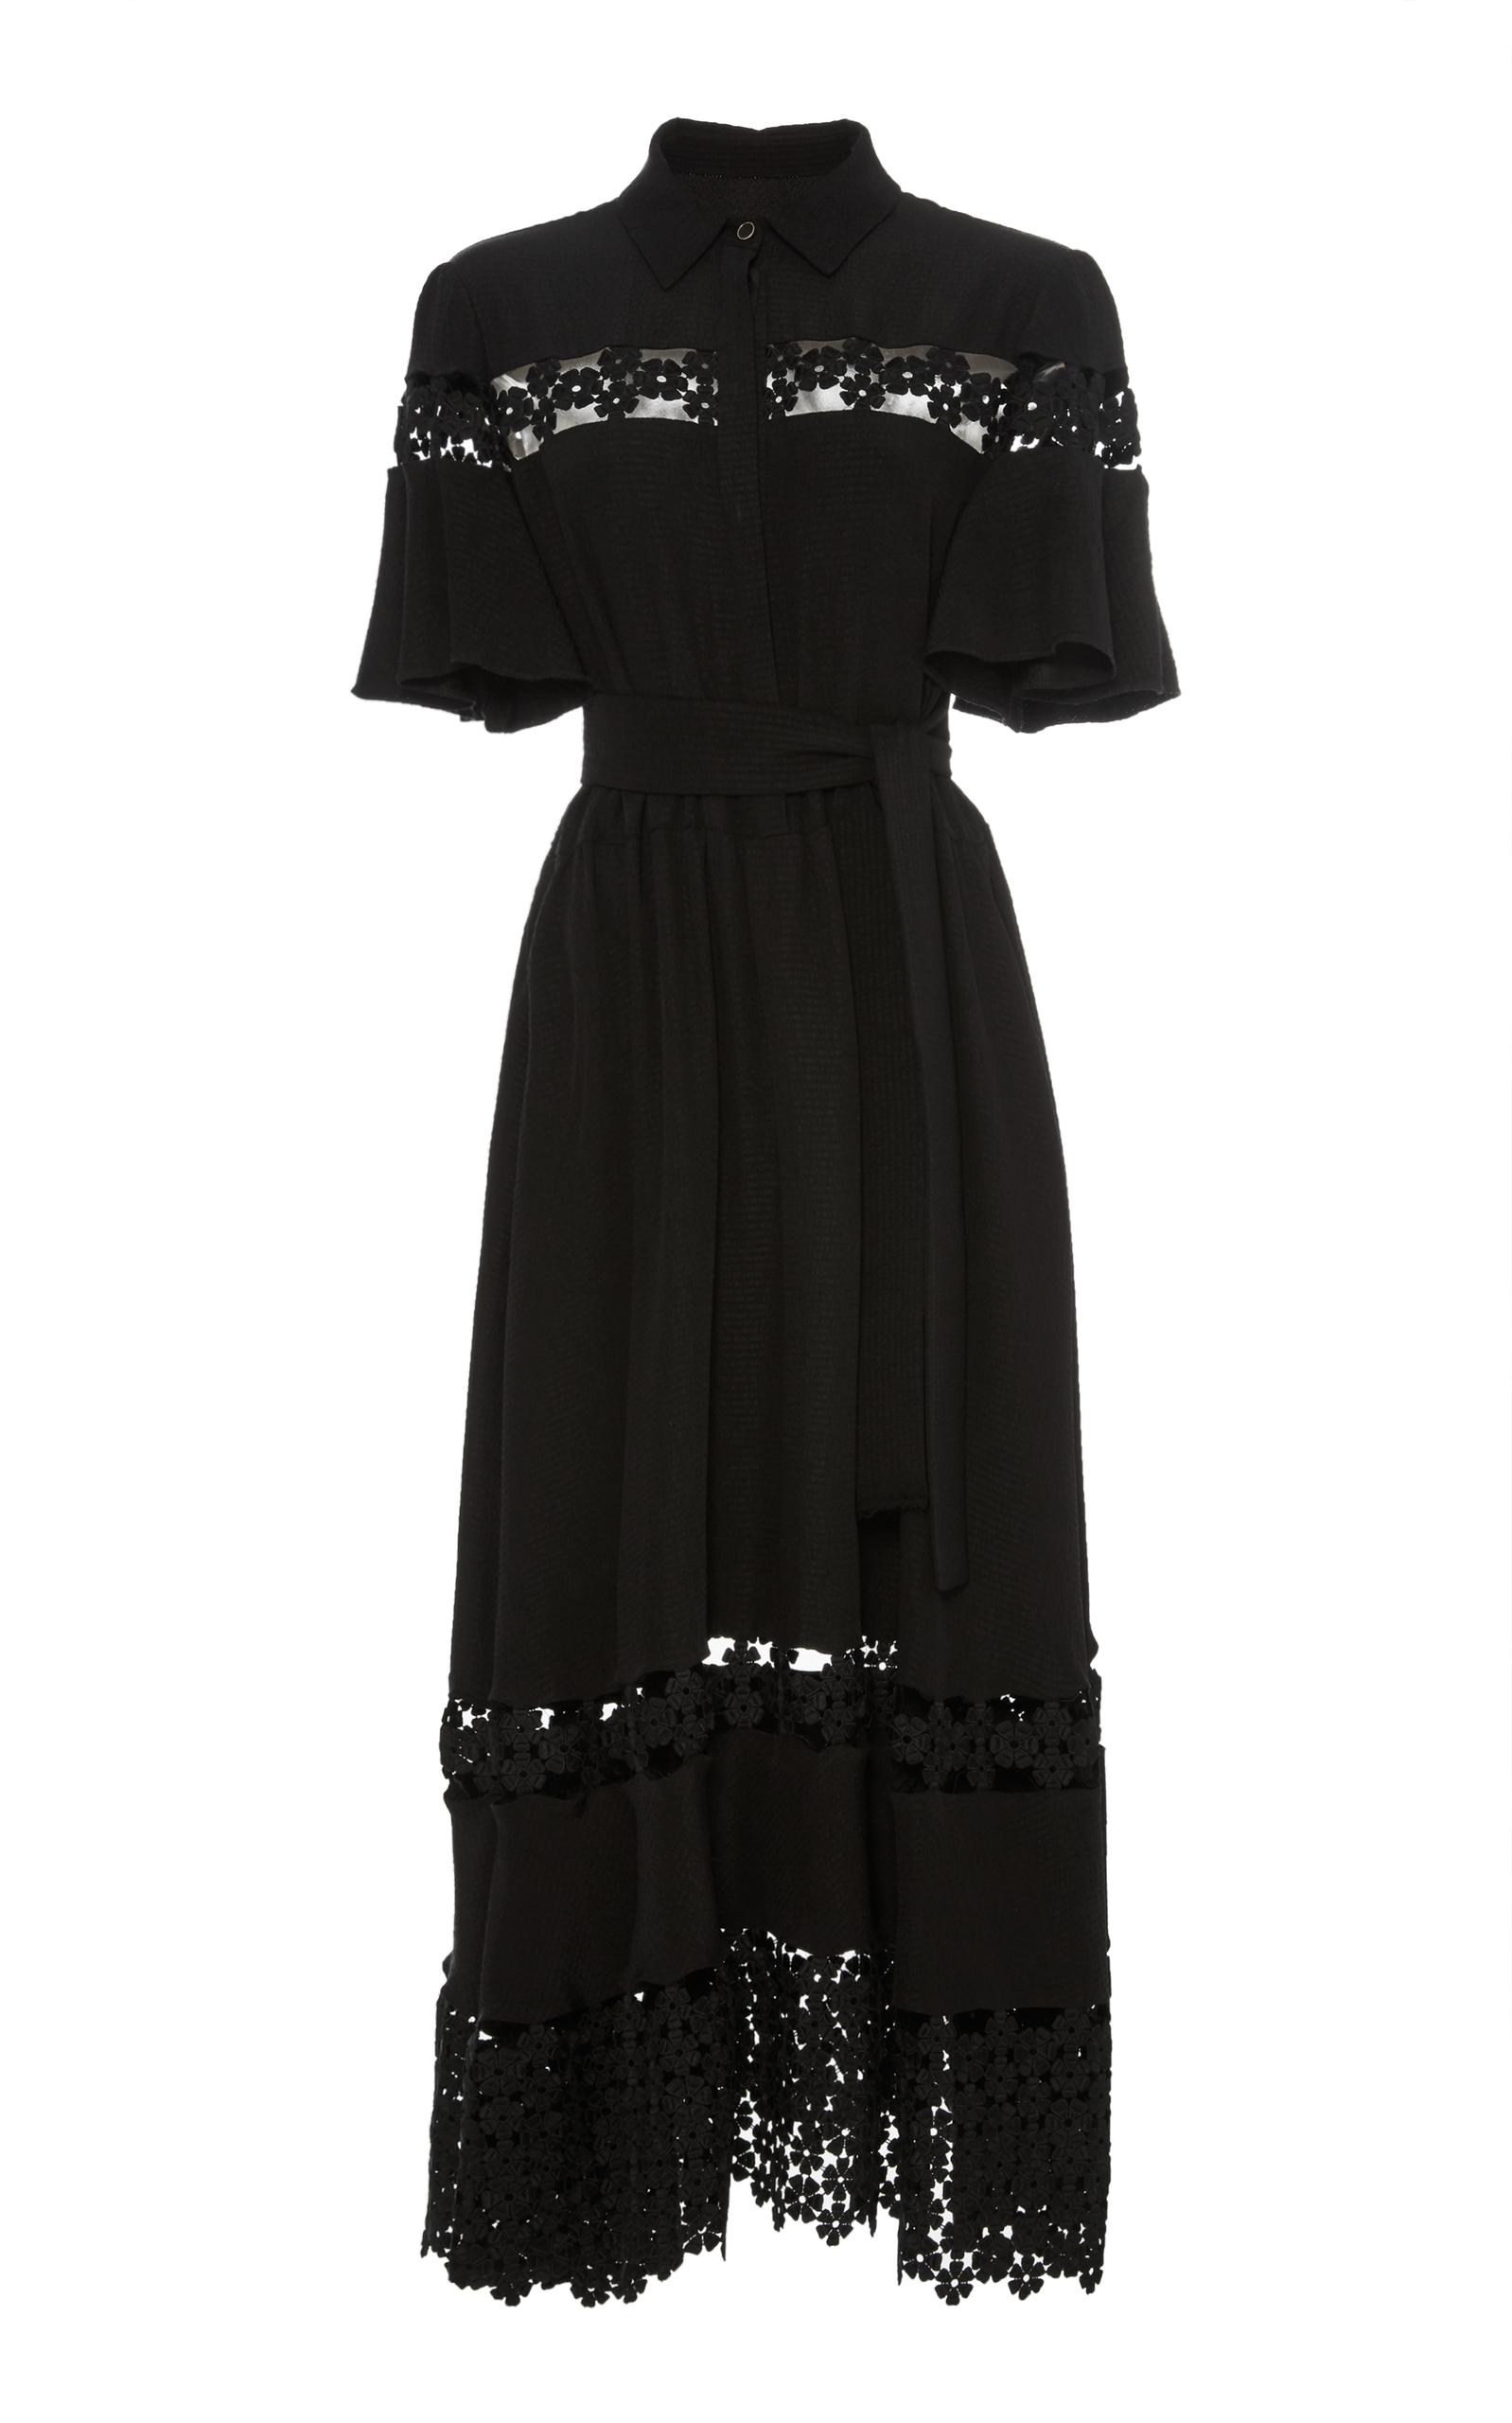 LELA ROSE LACE INSET FLUTTER SLEEVE SHIRT DRESS